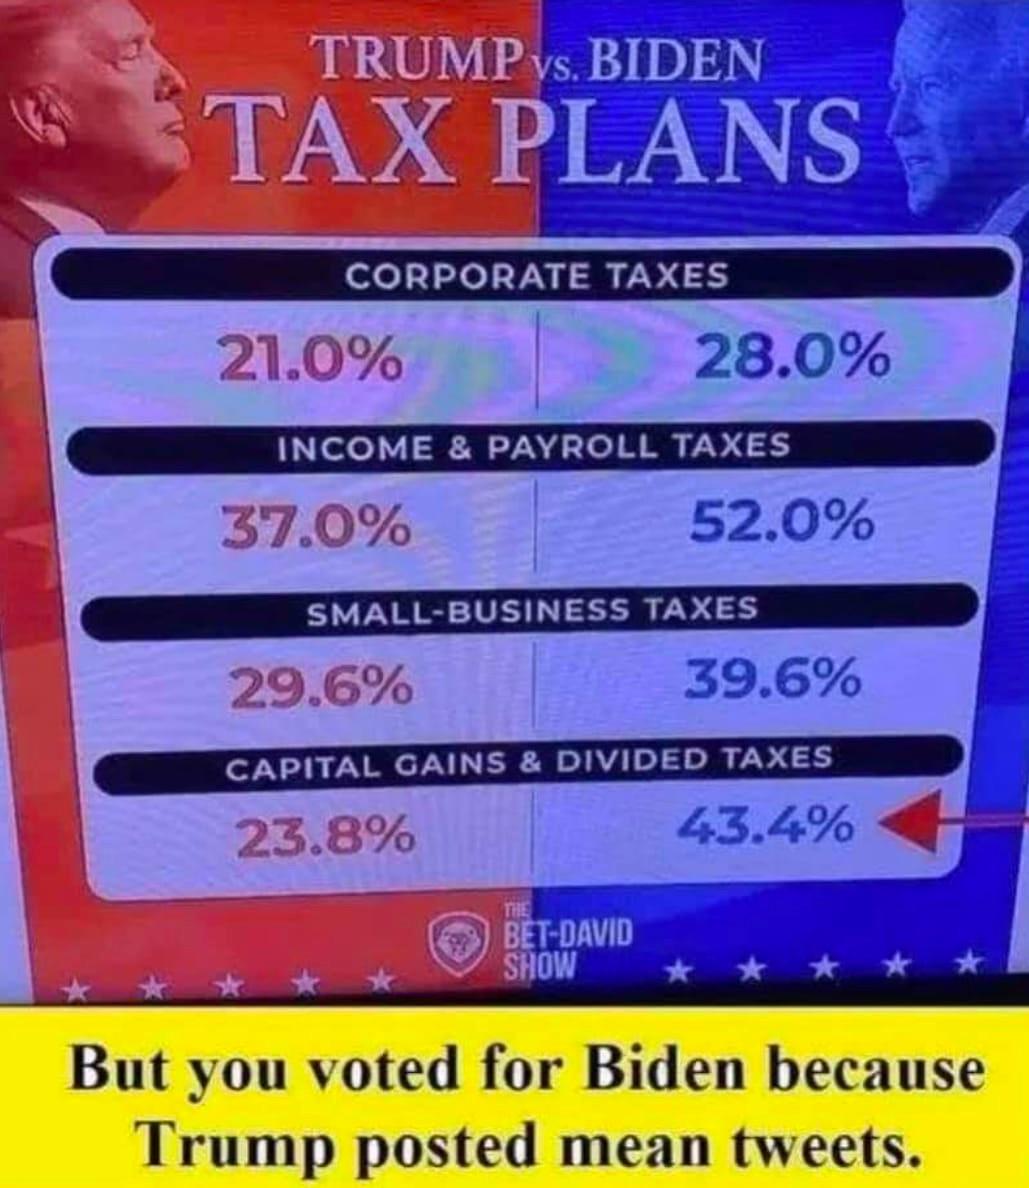 patrick bet david trump biden tax meme